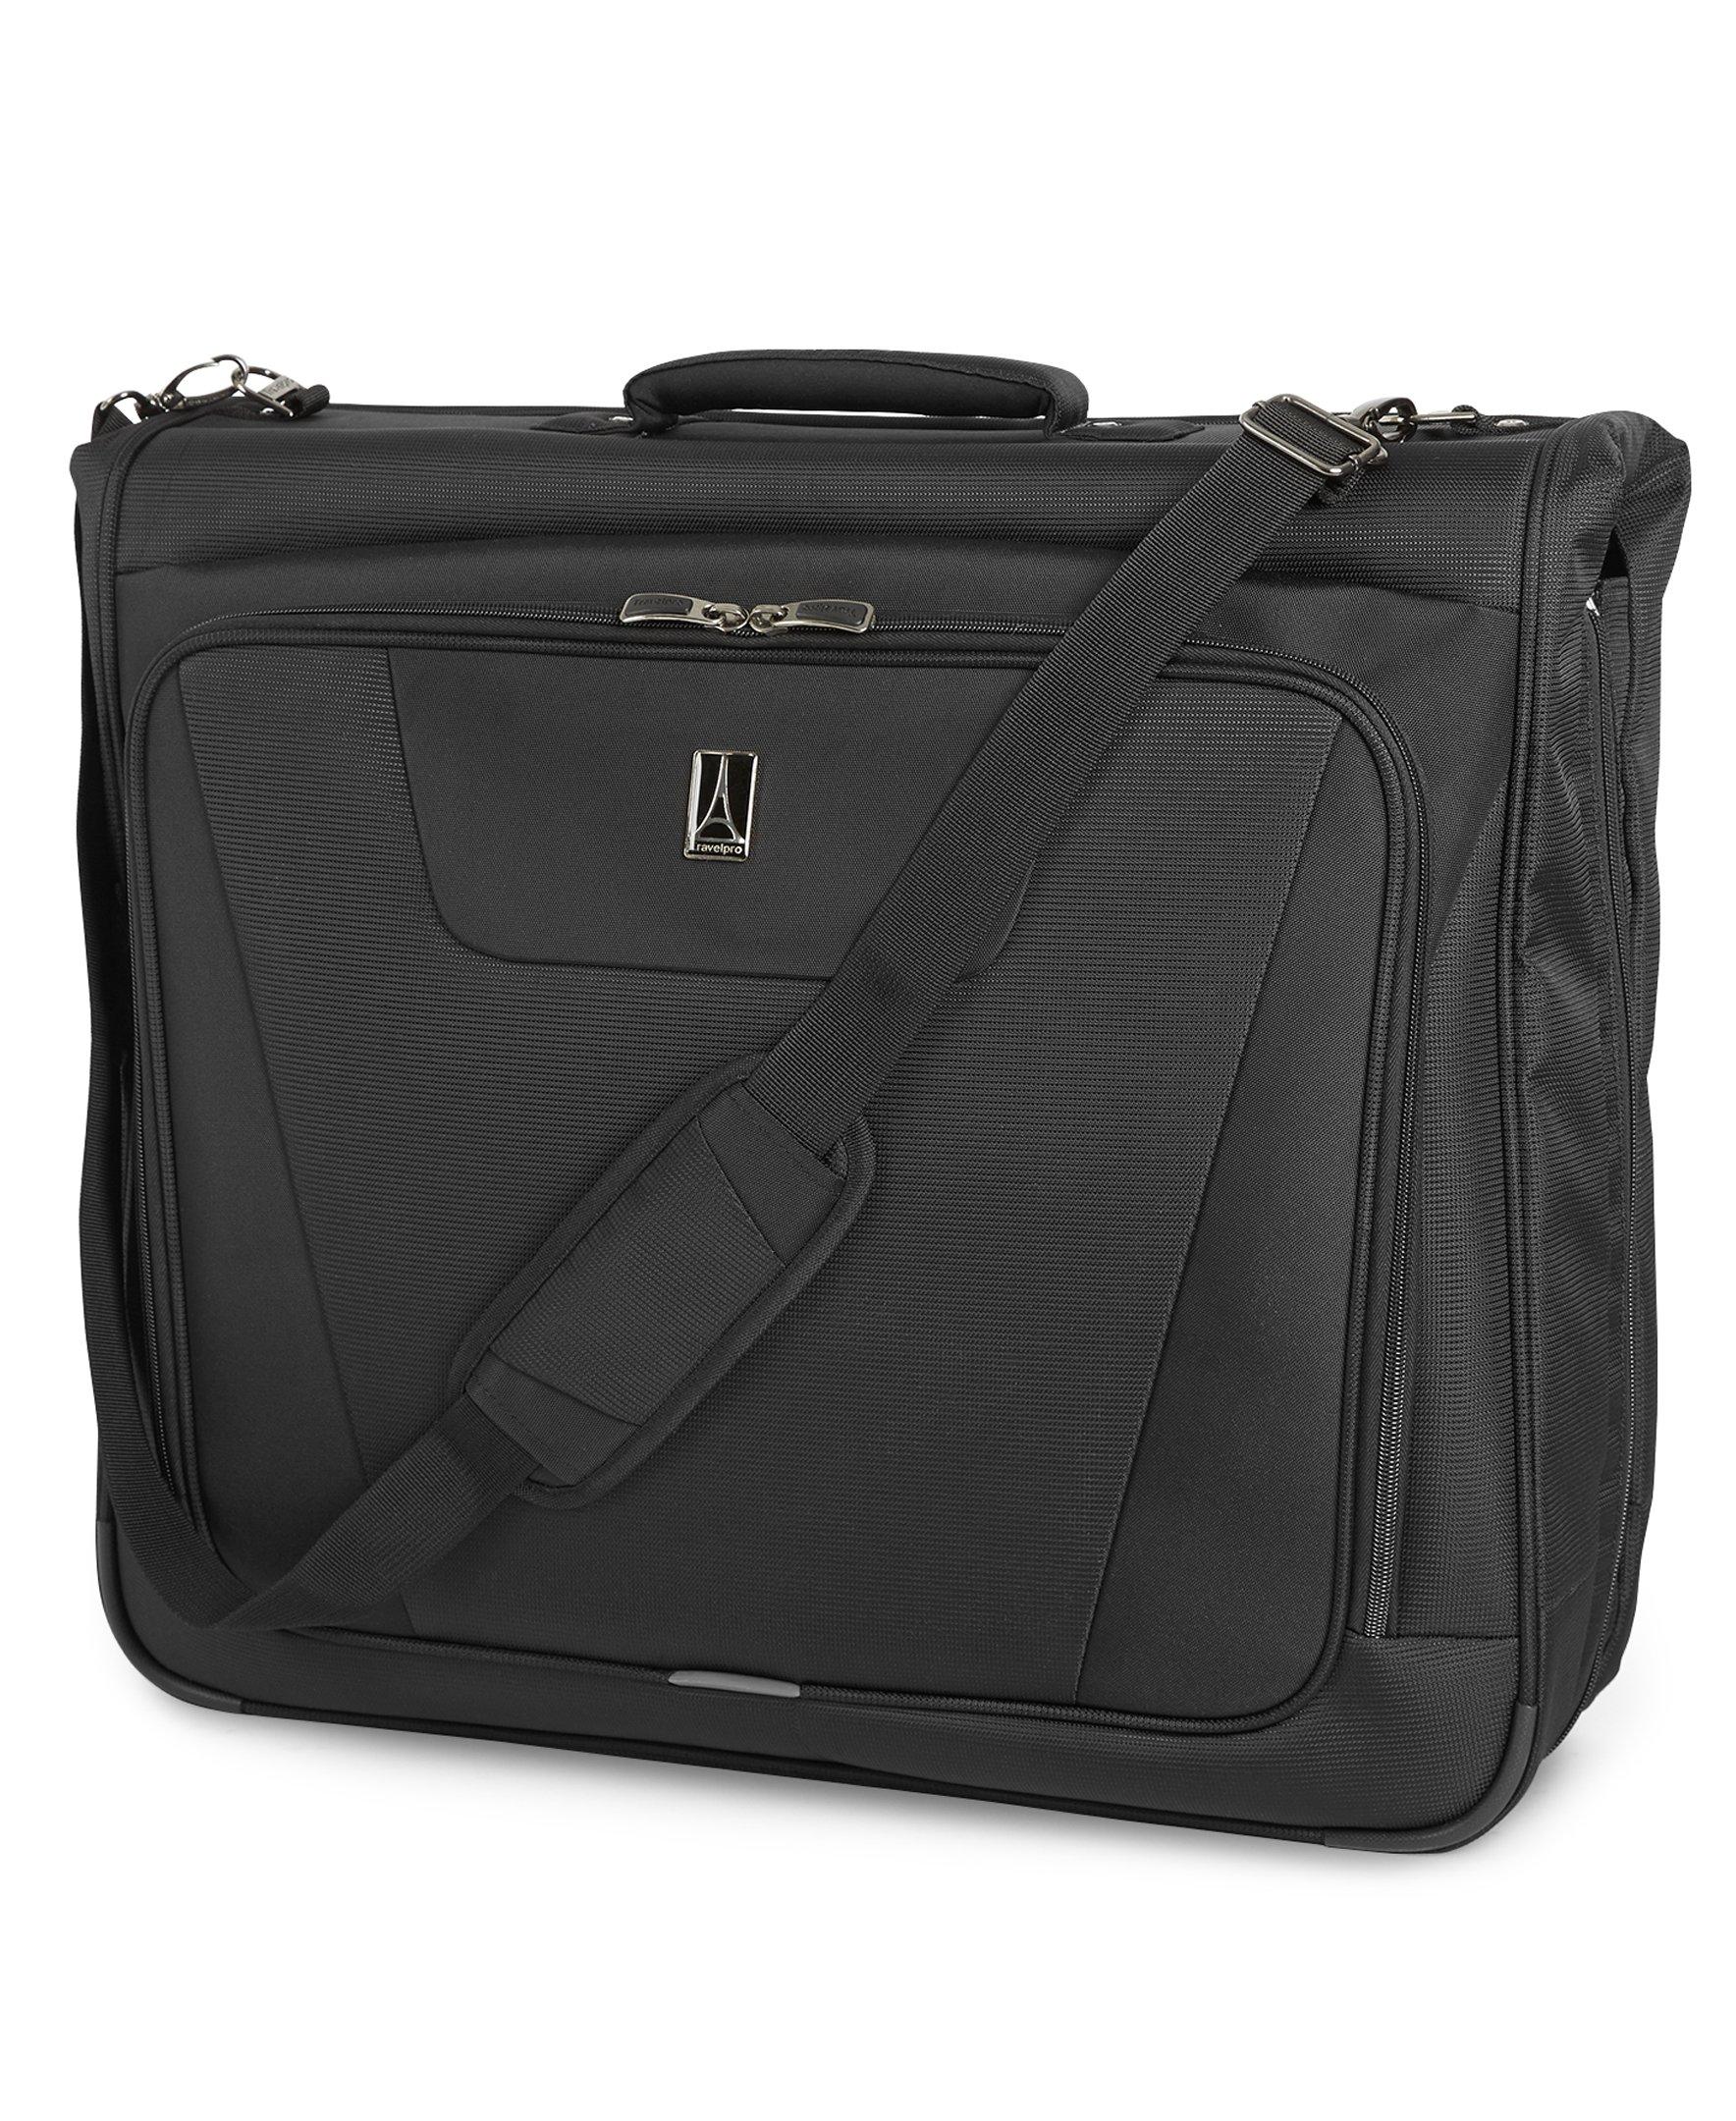 Travelpro Maxlite 4 Bifold Garment Sleeve, Black by Travelpro